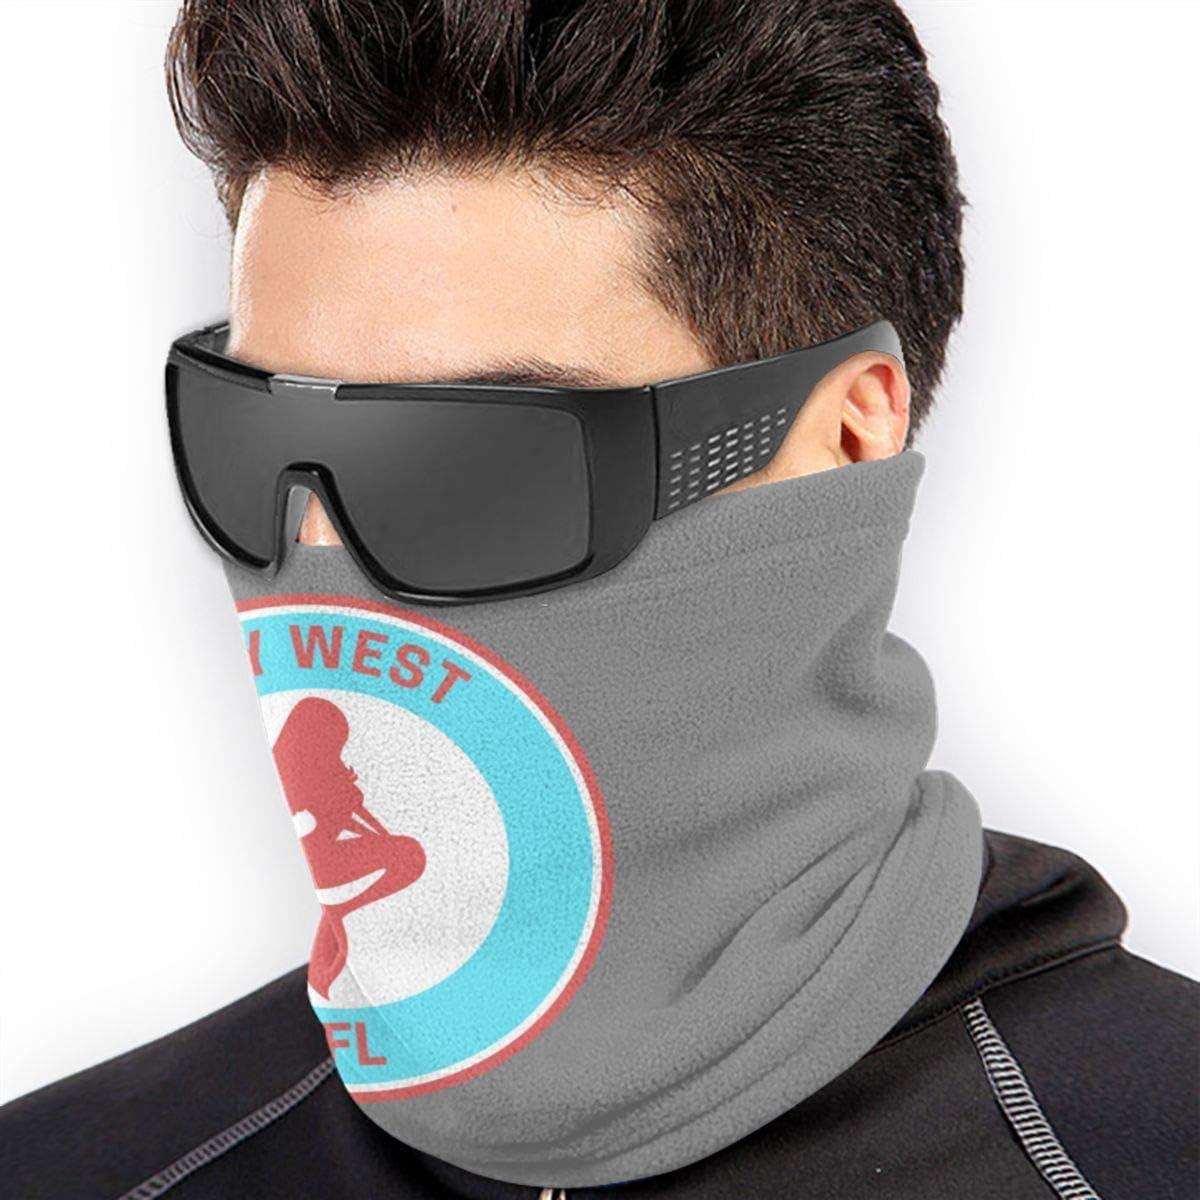 Key West Florida Microfiber Neck Warmer Scarf Gaiter Headwear Face Mask Bandanas